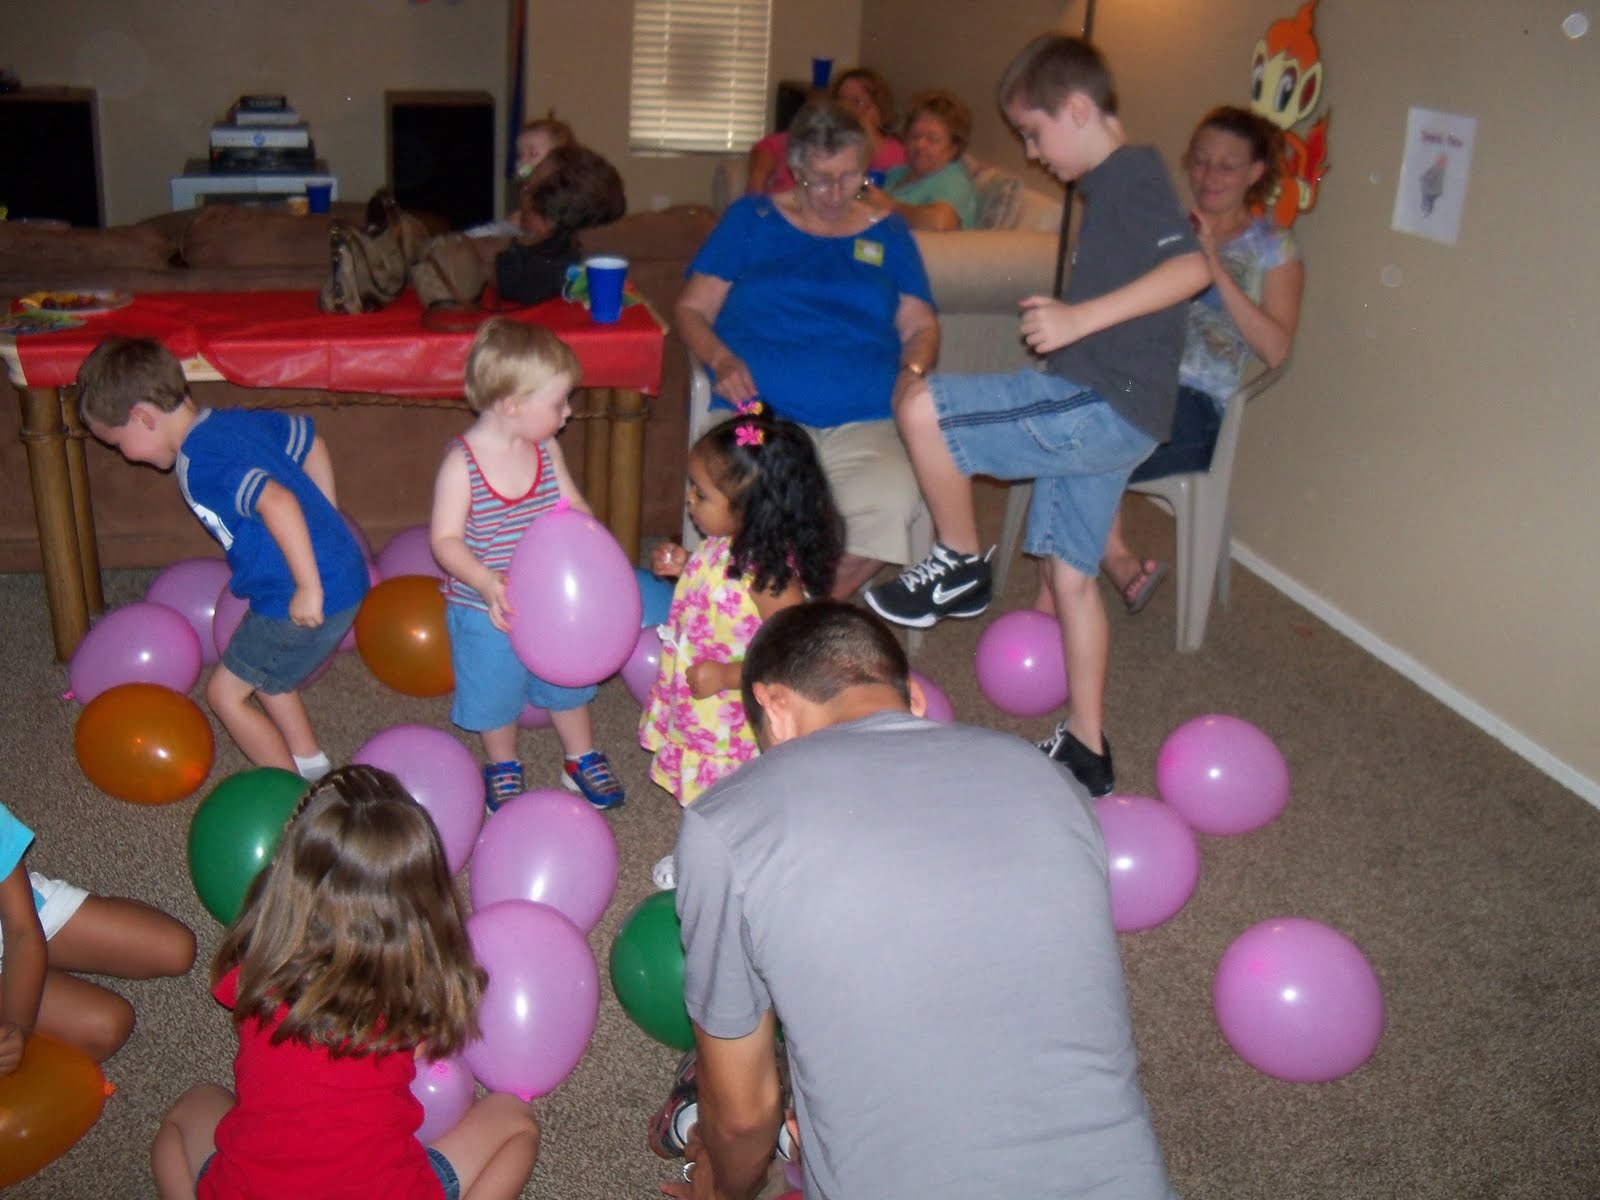 The Creative Party Mom Pokemon Adams 9th Birthday